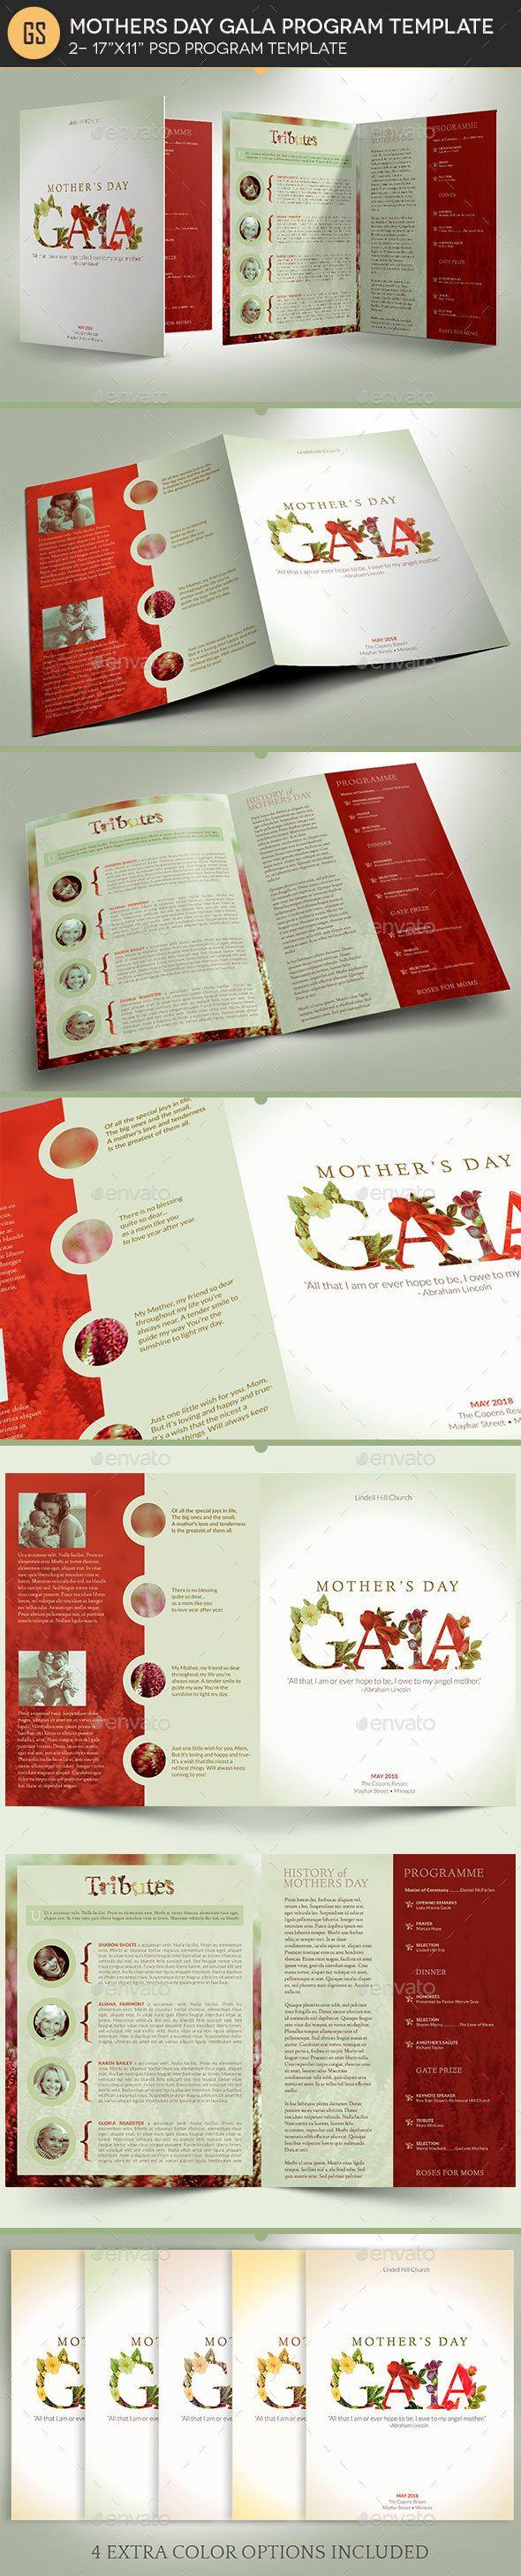 mothers gala program template informational brochures healy